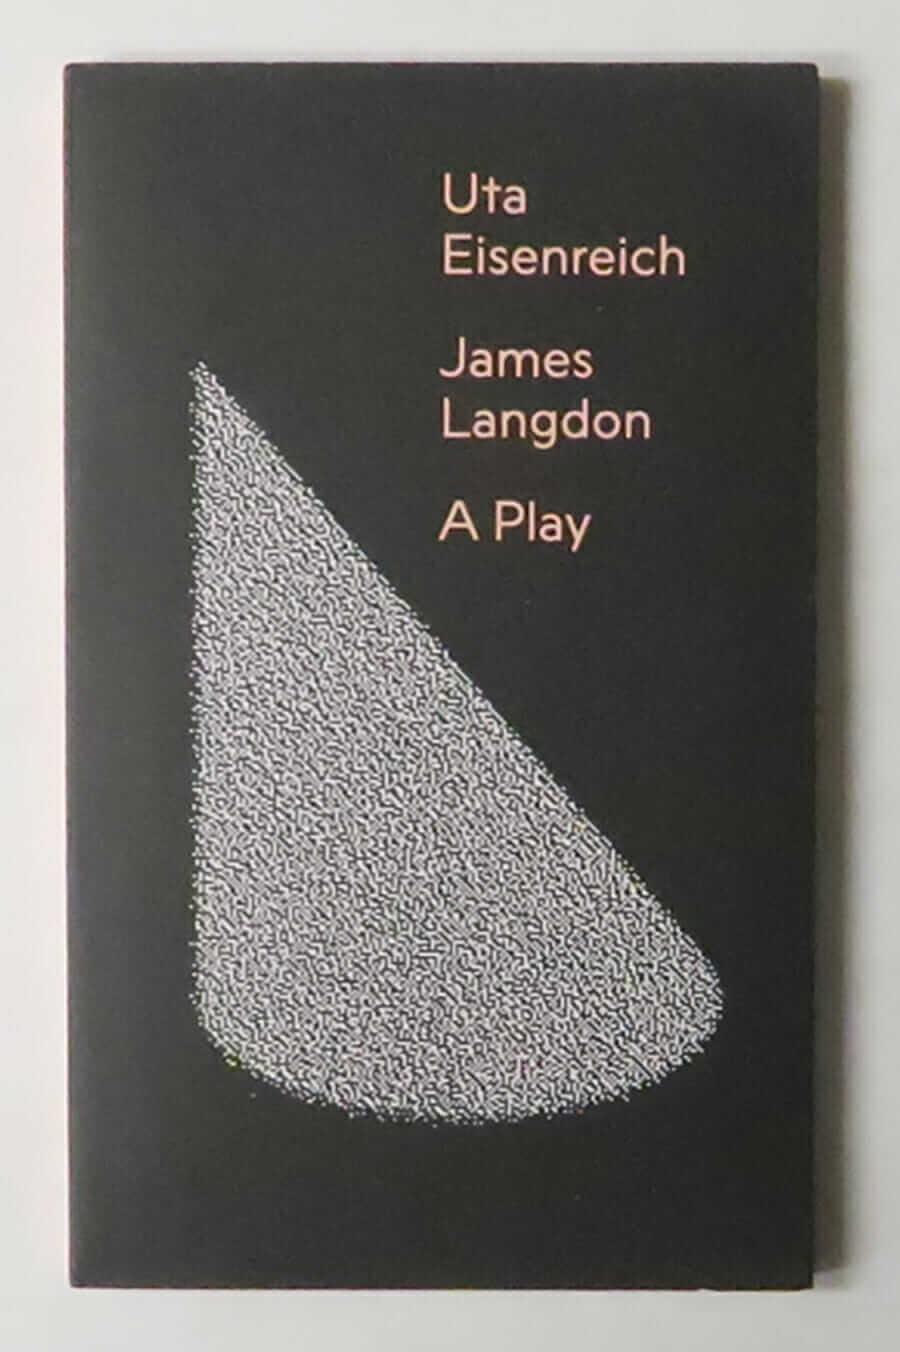 A Play | Uta Eisenreich and James Langdon